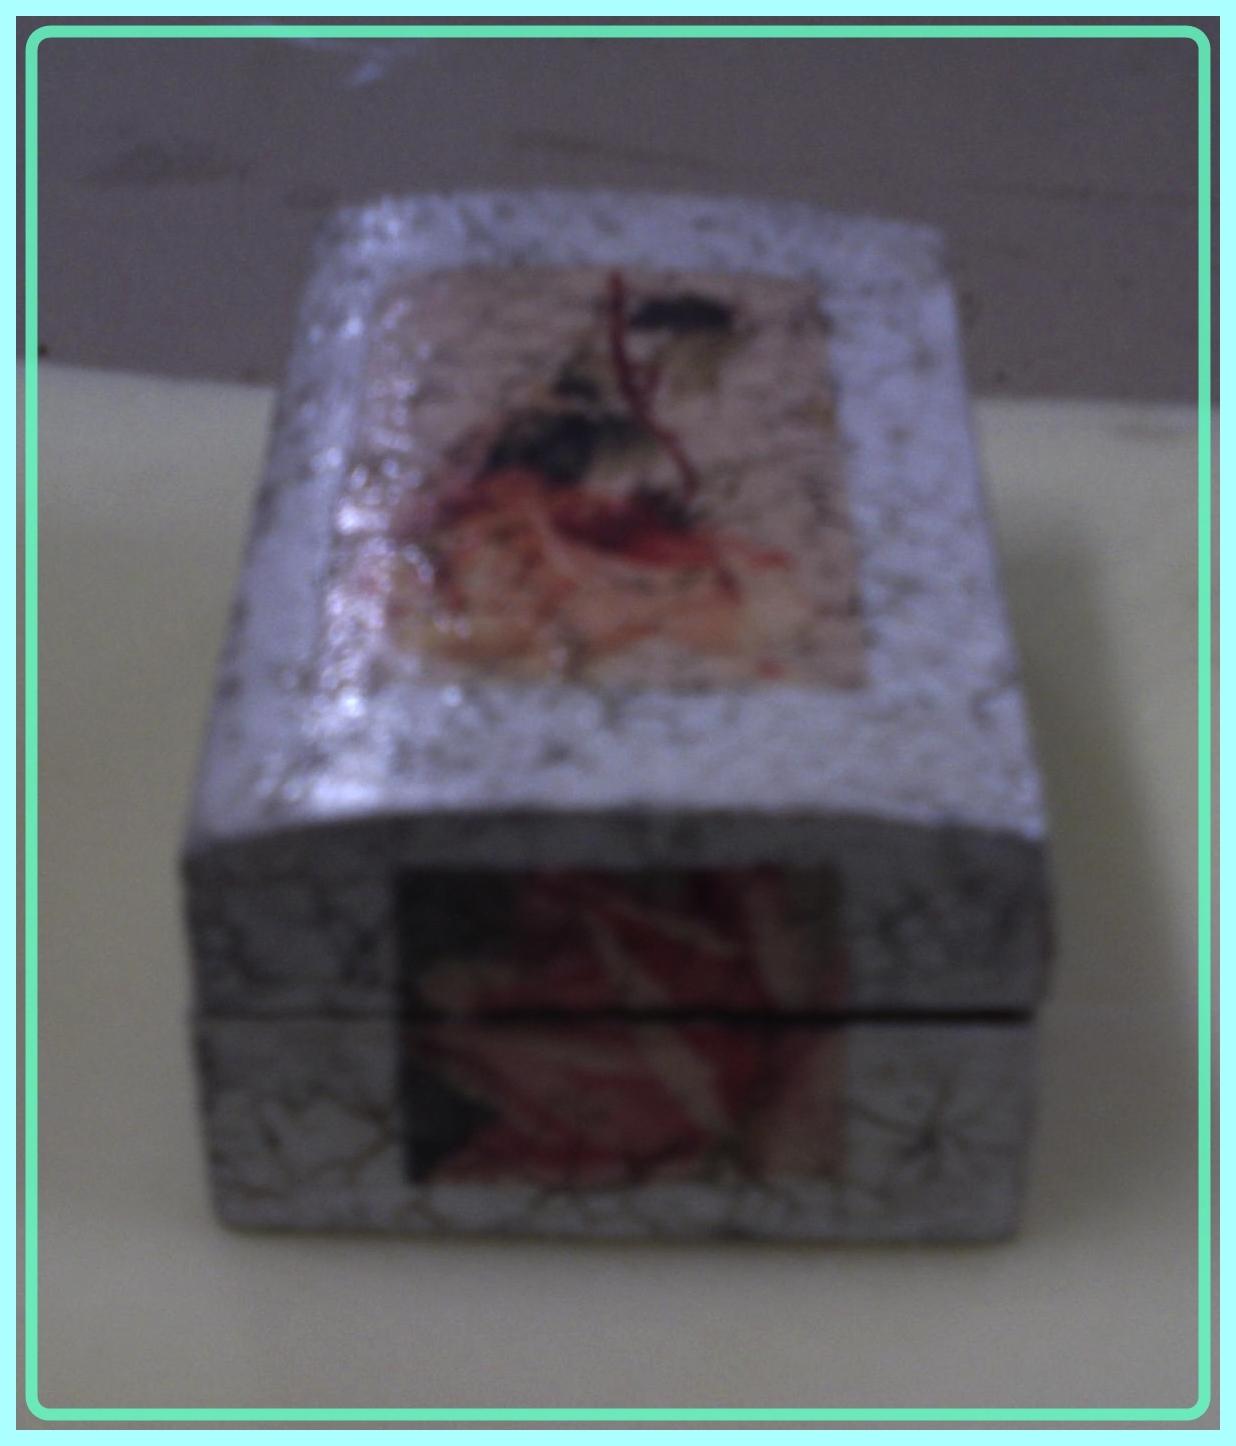 Simplemente manualidades caja de madera craquelada - Manualidades caja de madera ...